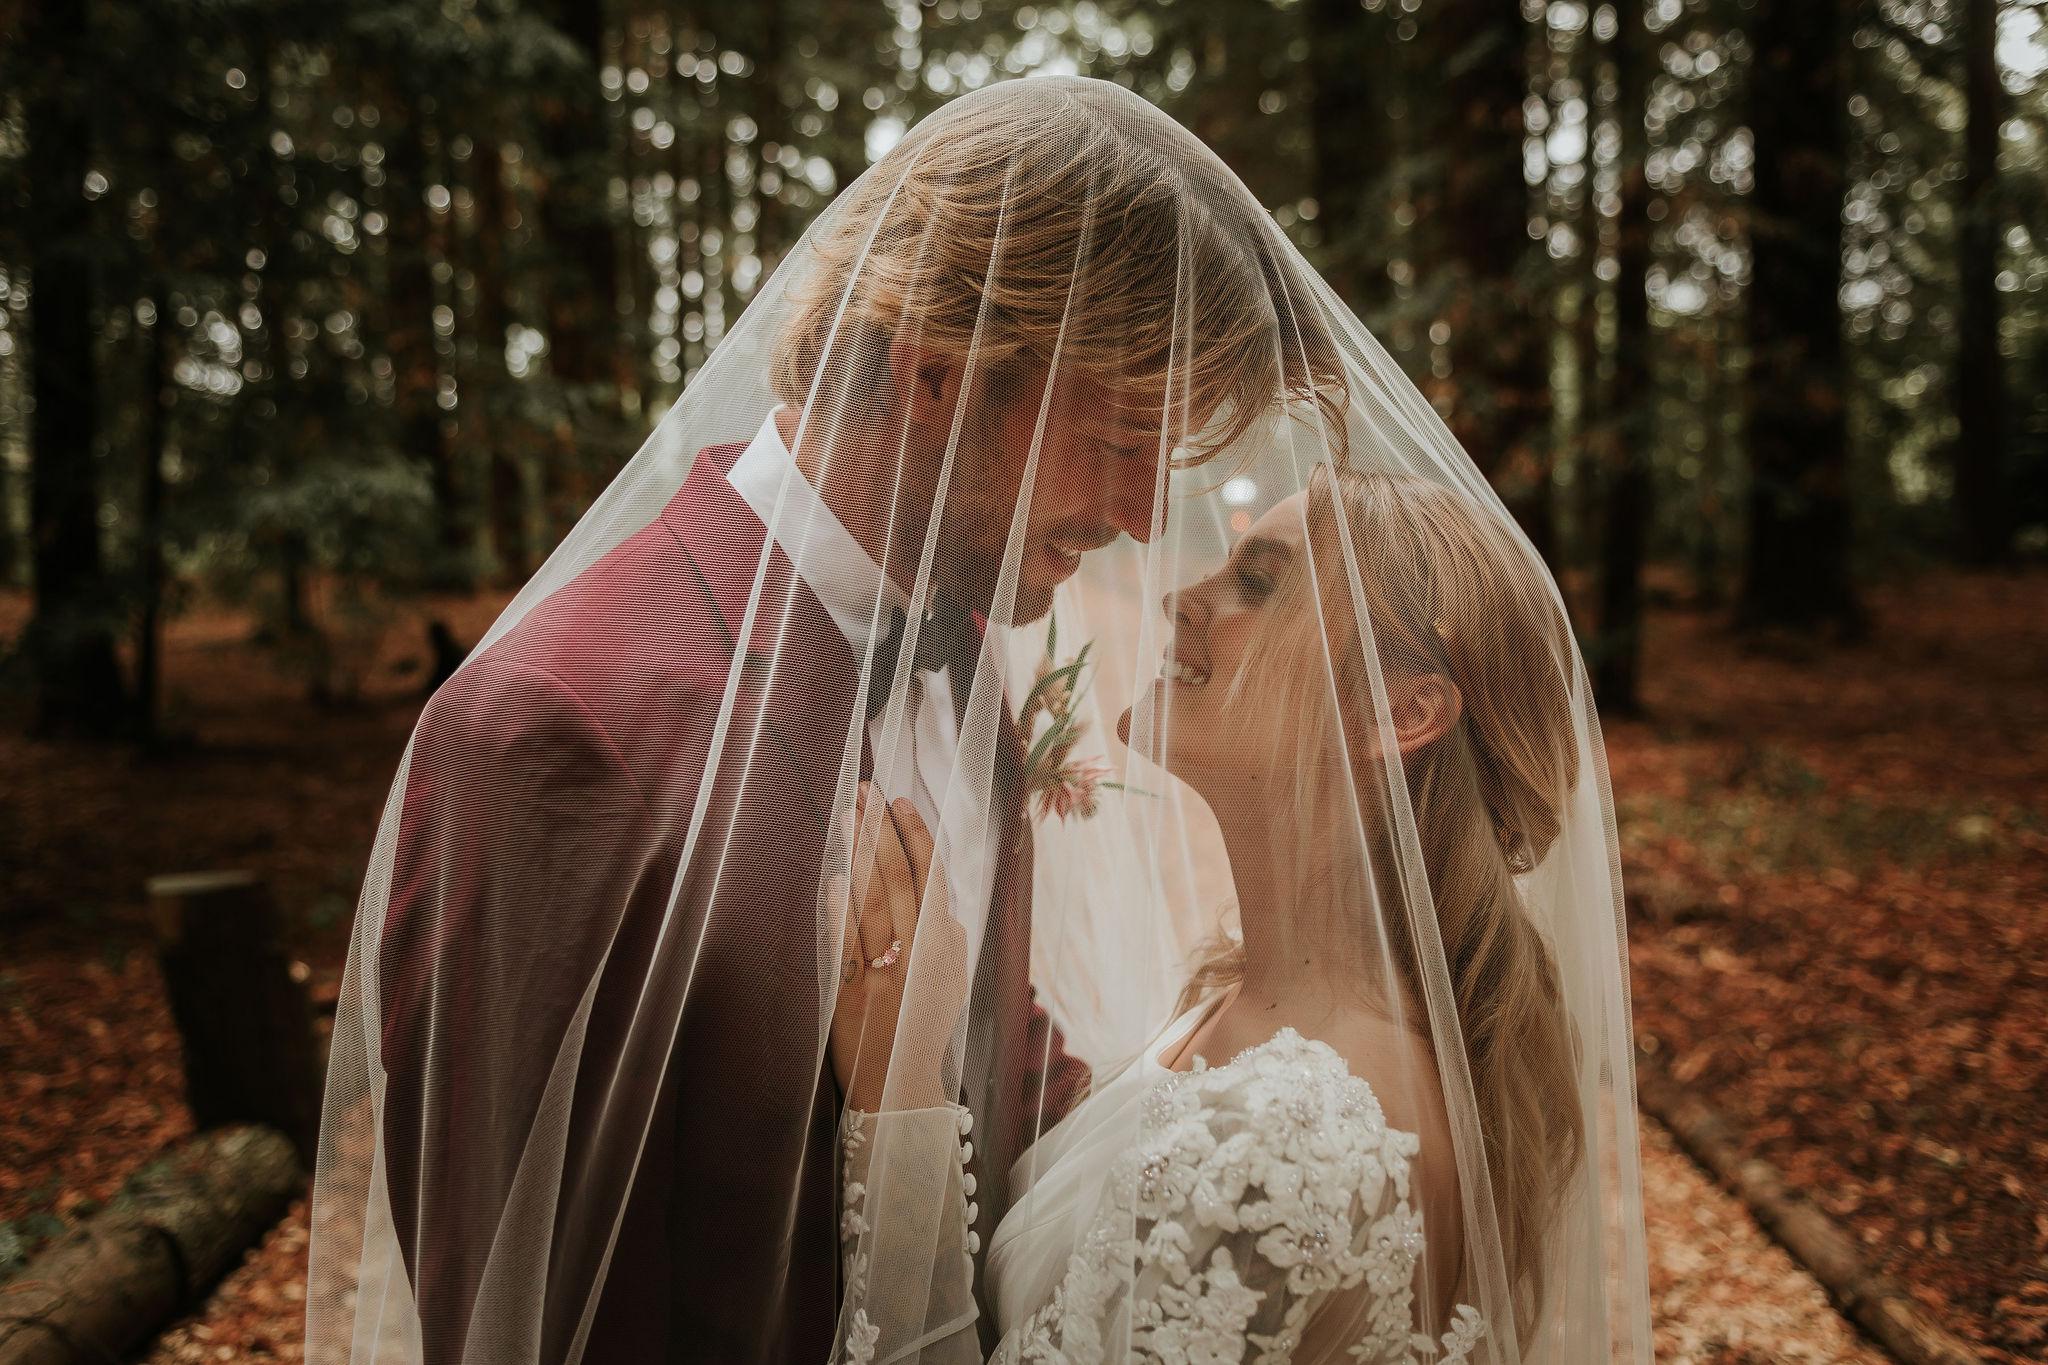 modern woodland wedding - romantic wedding photography - bride and groom under veil